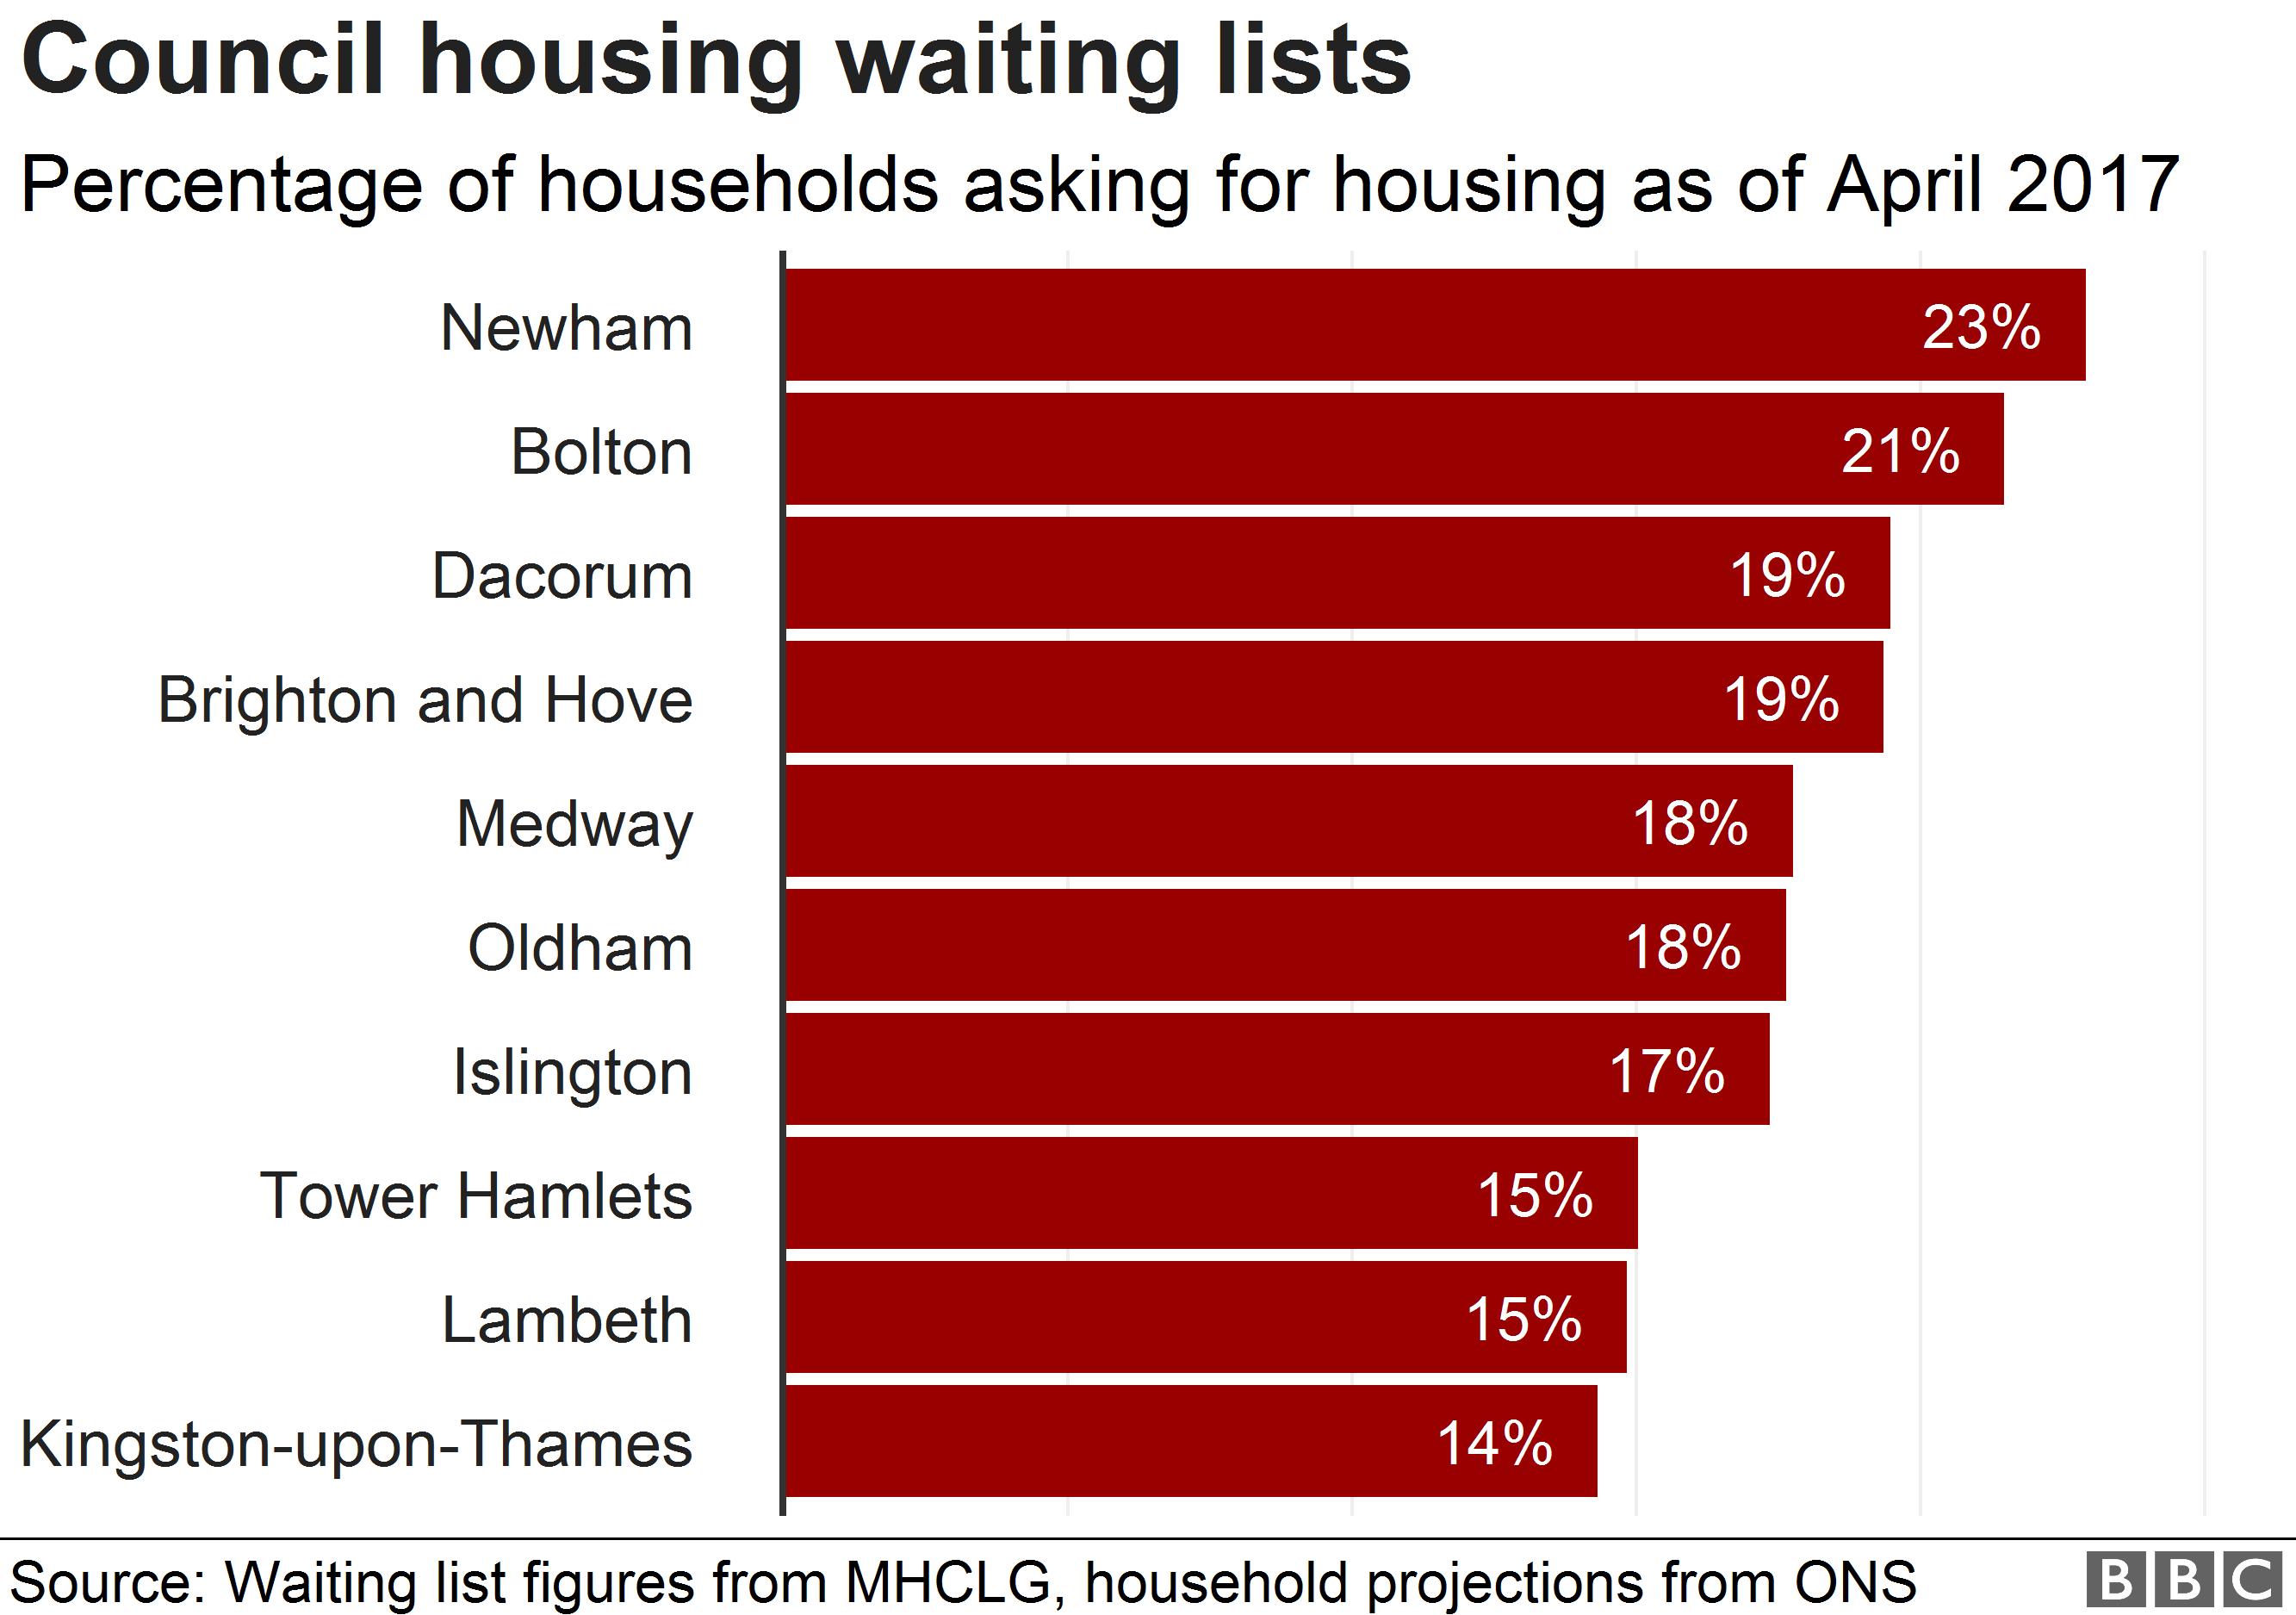 Council house waiting list data